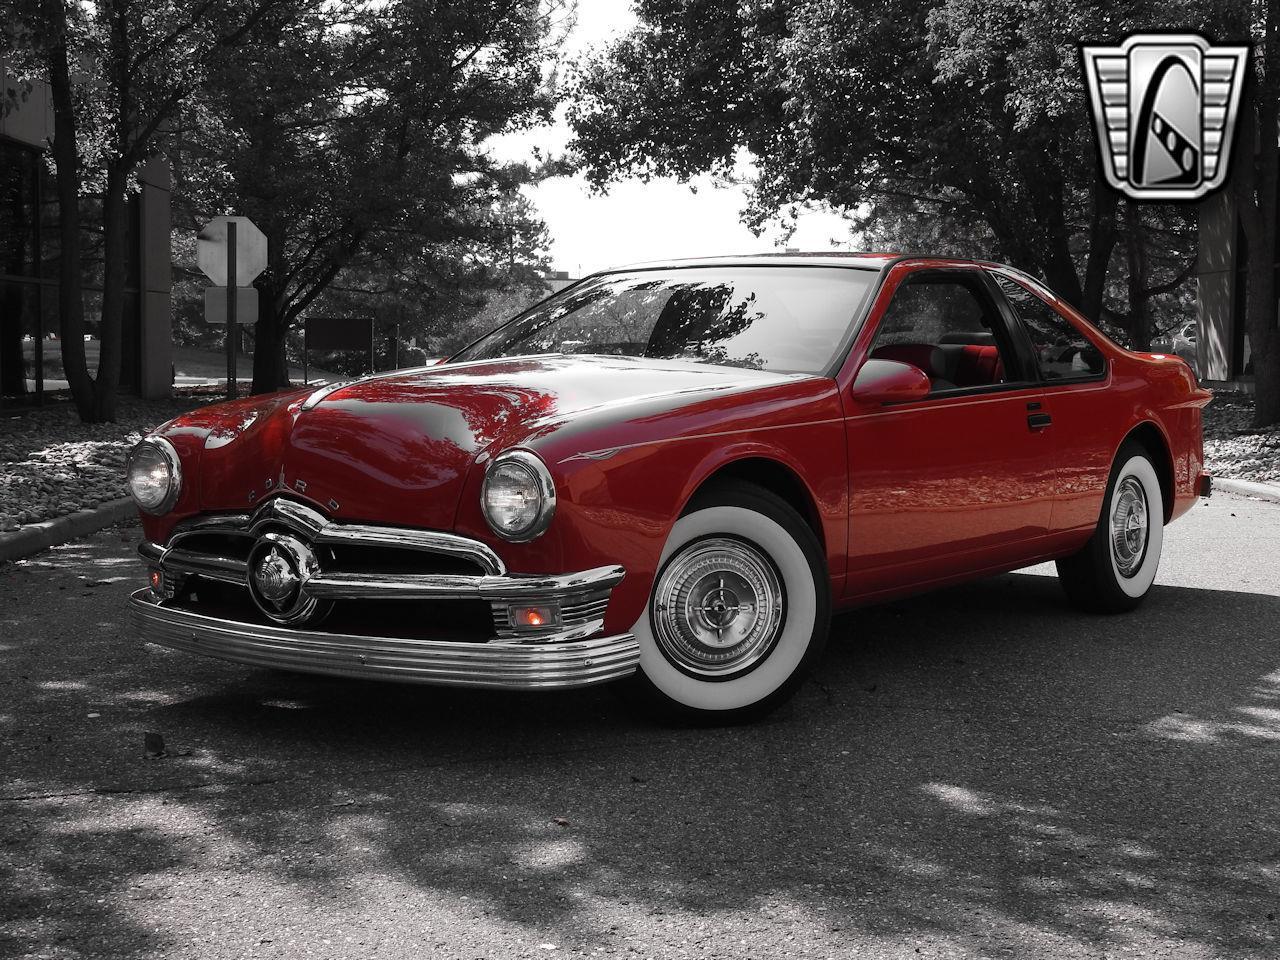 1992 Ford Thunderbird (CC-1341115) for sale in O'Fallon, Illinois